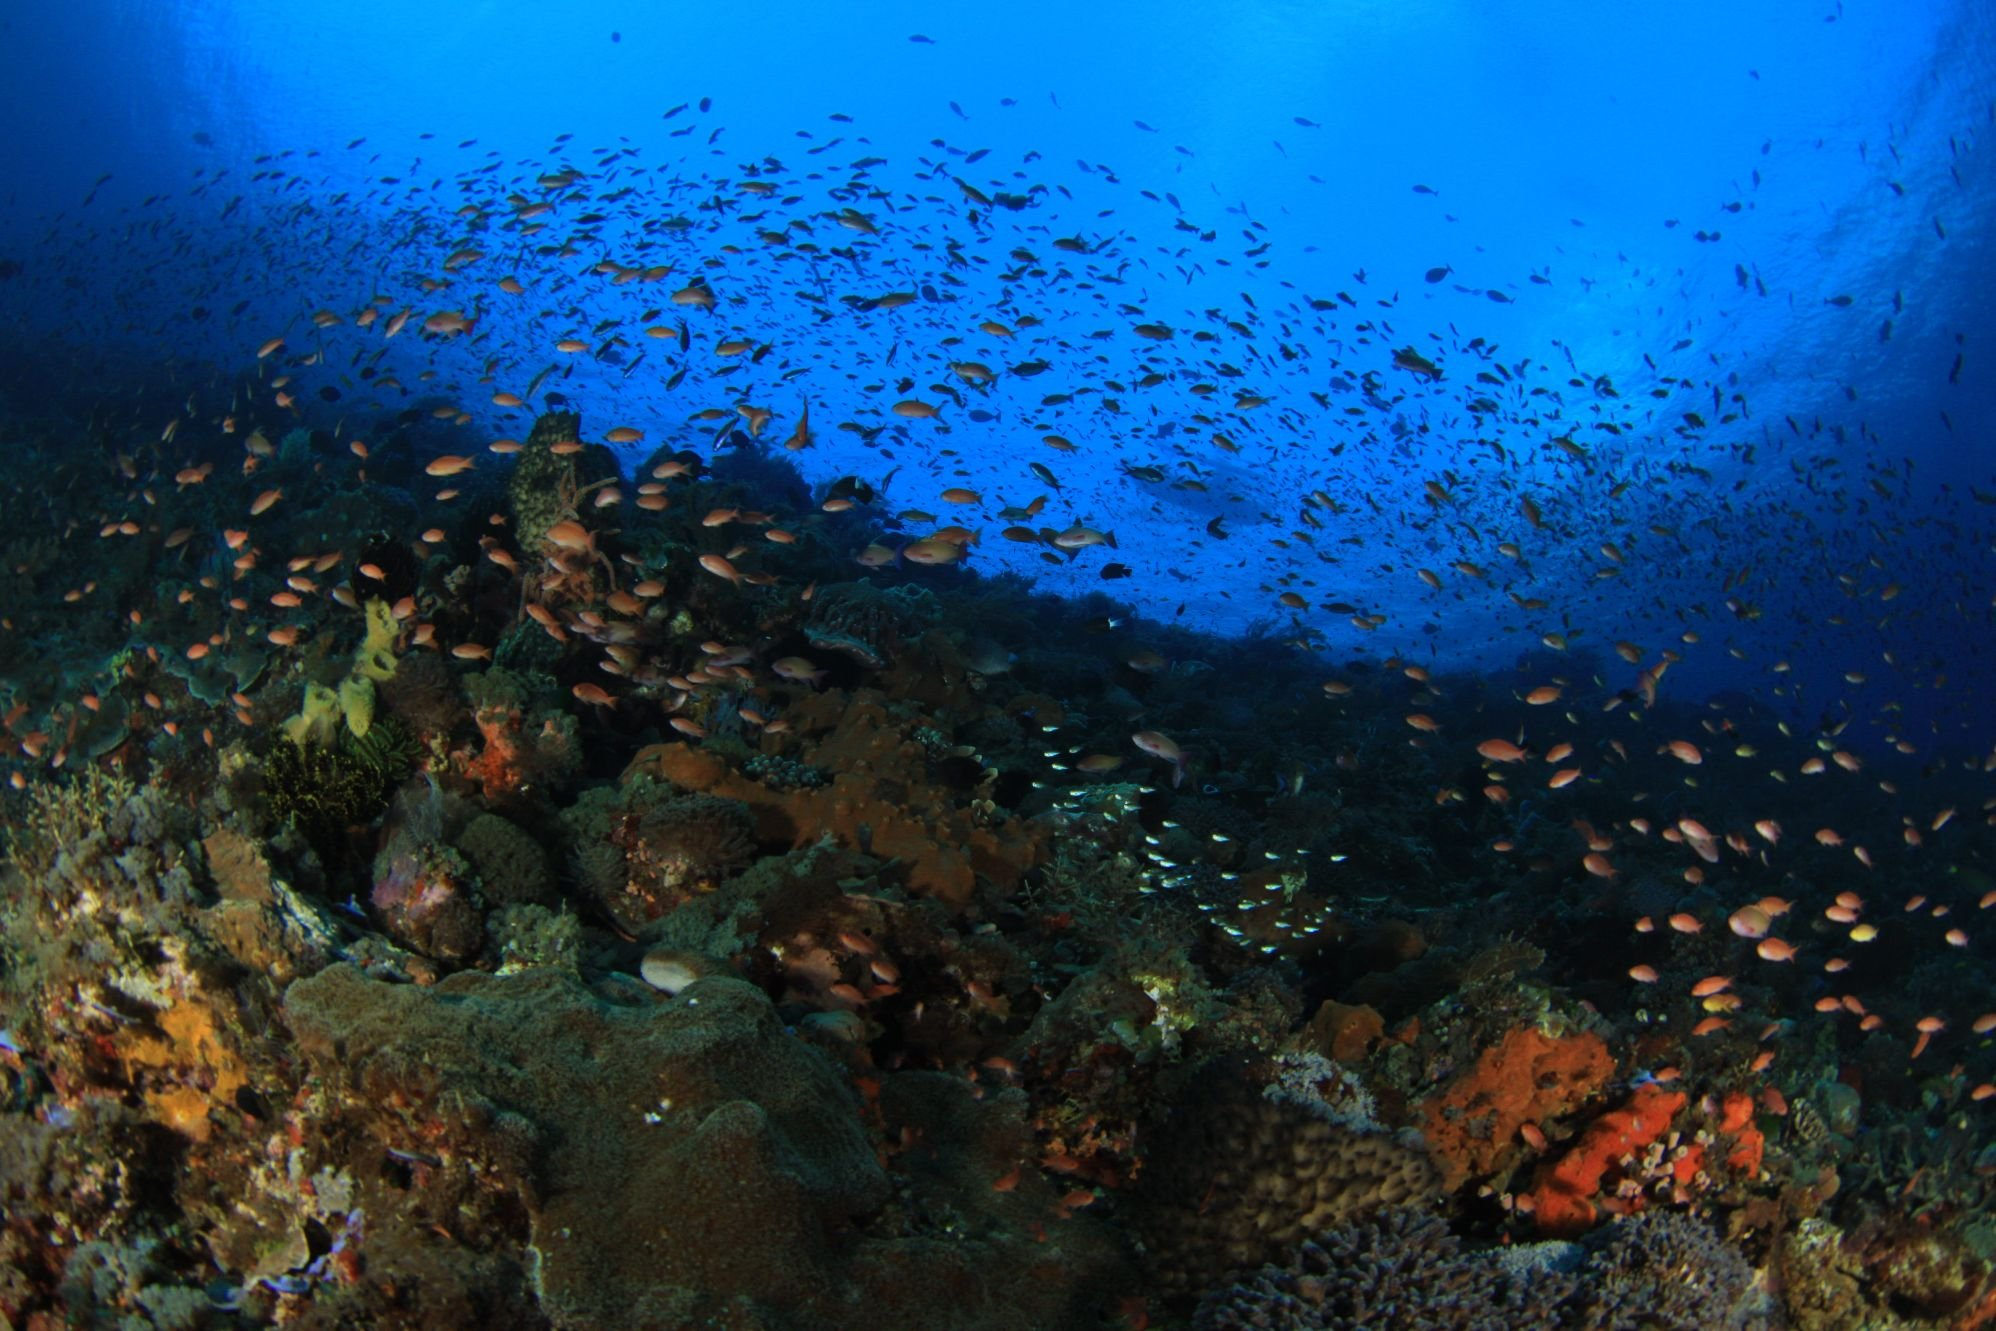 Alor under water